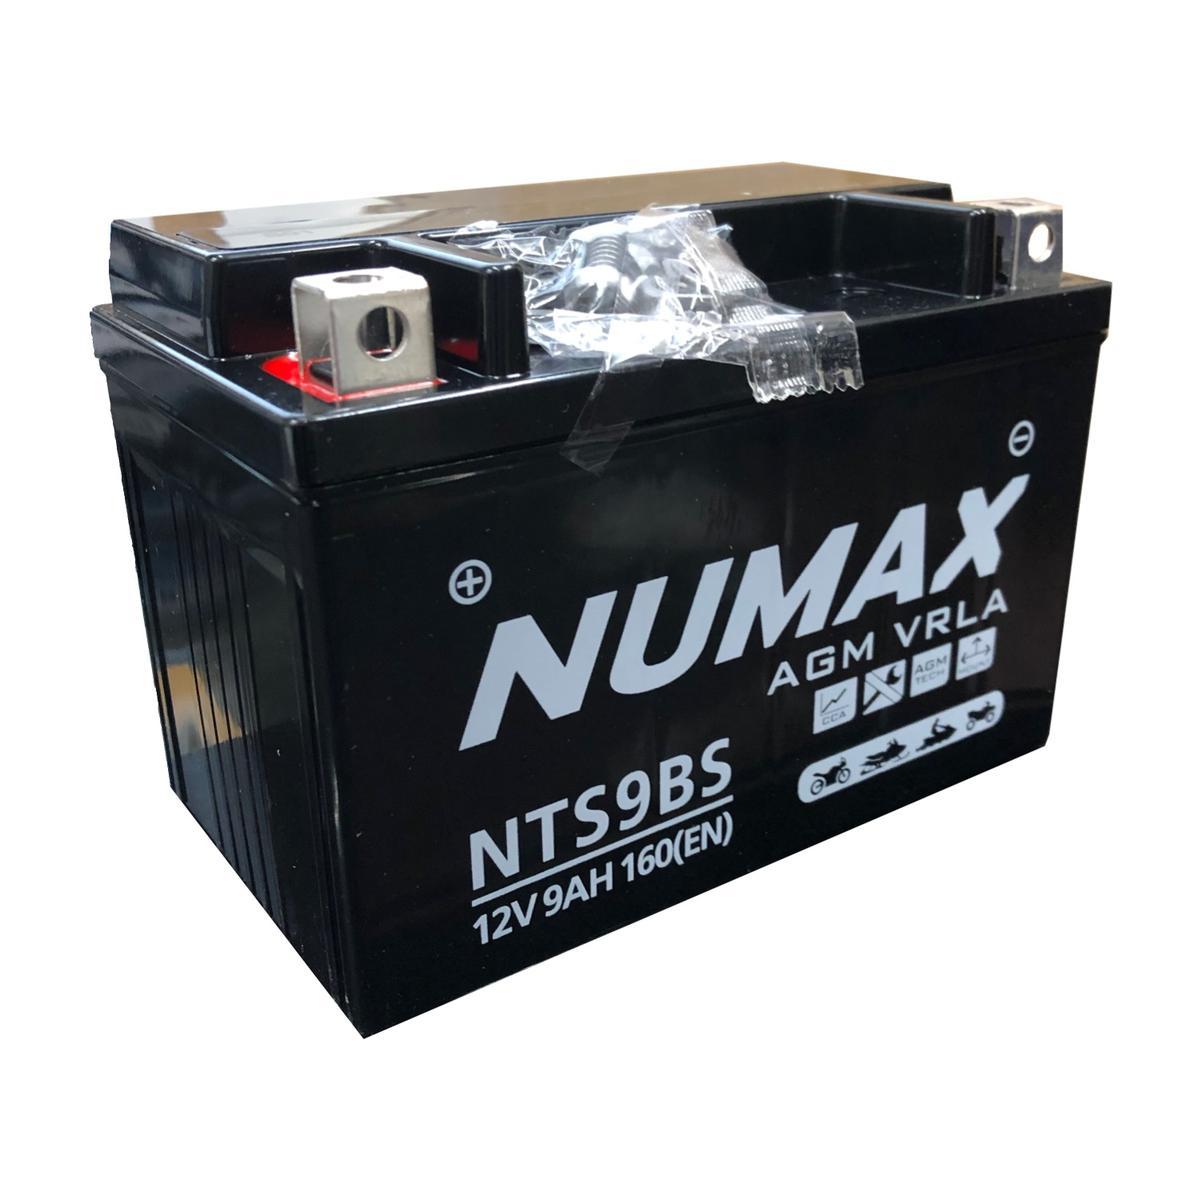 Numax NTS9BS 12v Motorbike Bike Gel Battery HONDA 750cc VF750c Magna YXT9-4